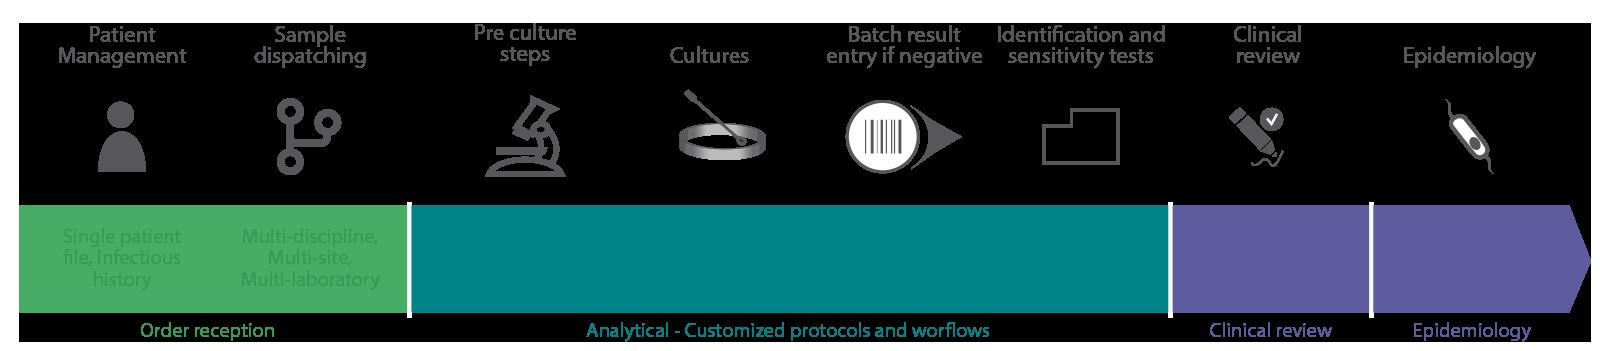 TDNexLabs_Microbiology_Workflow